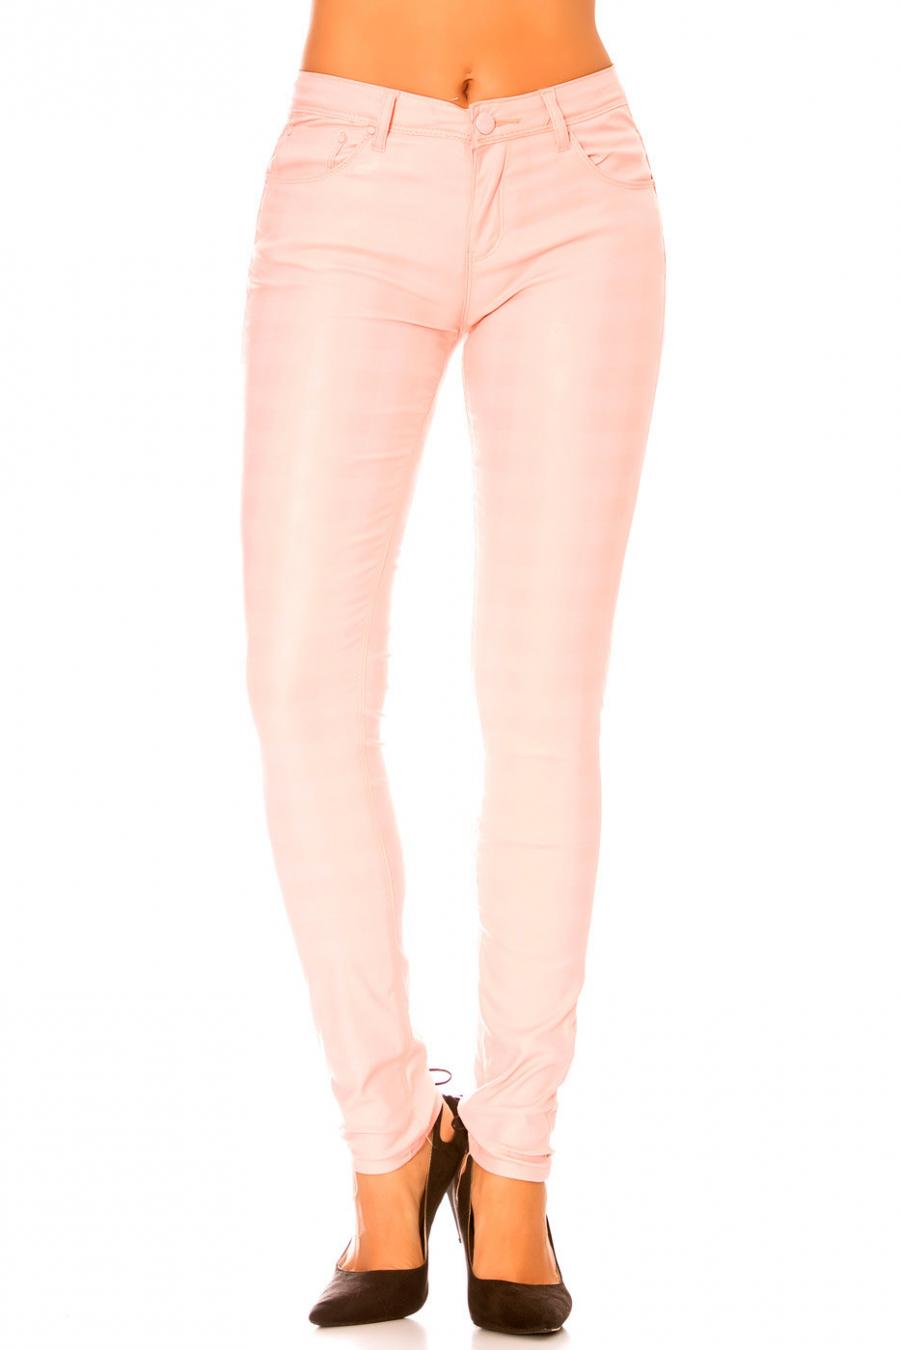 Pantalon rose brillant avec poche et motif carreau . Pantalon mode s1799-2